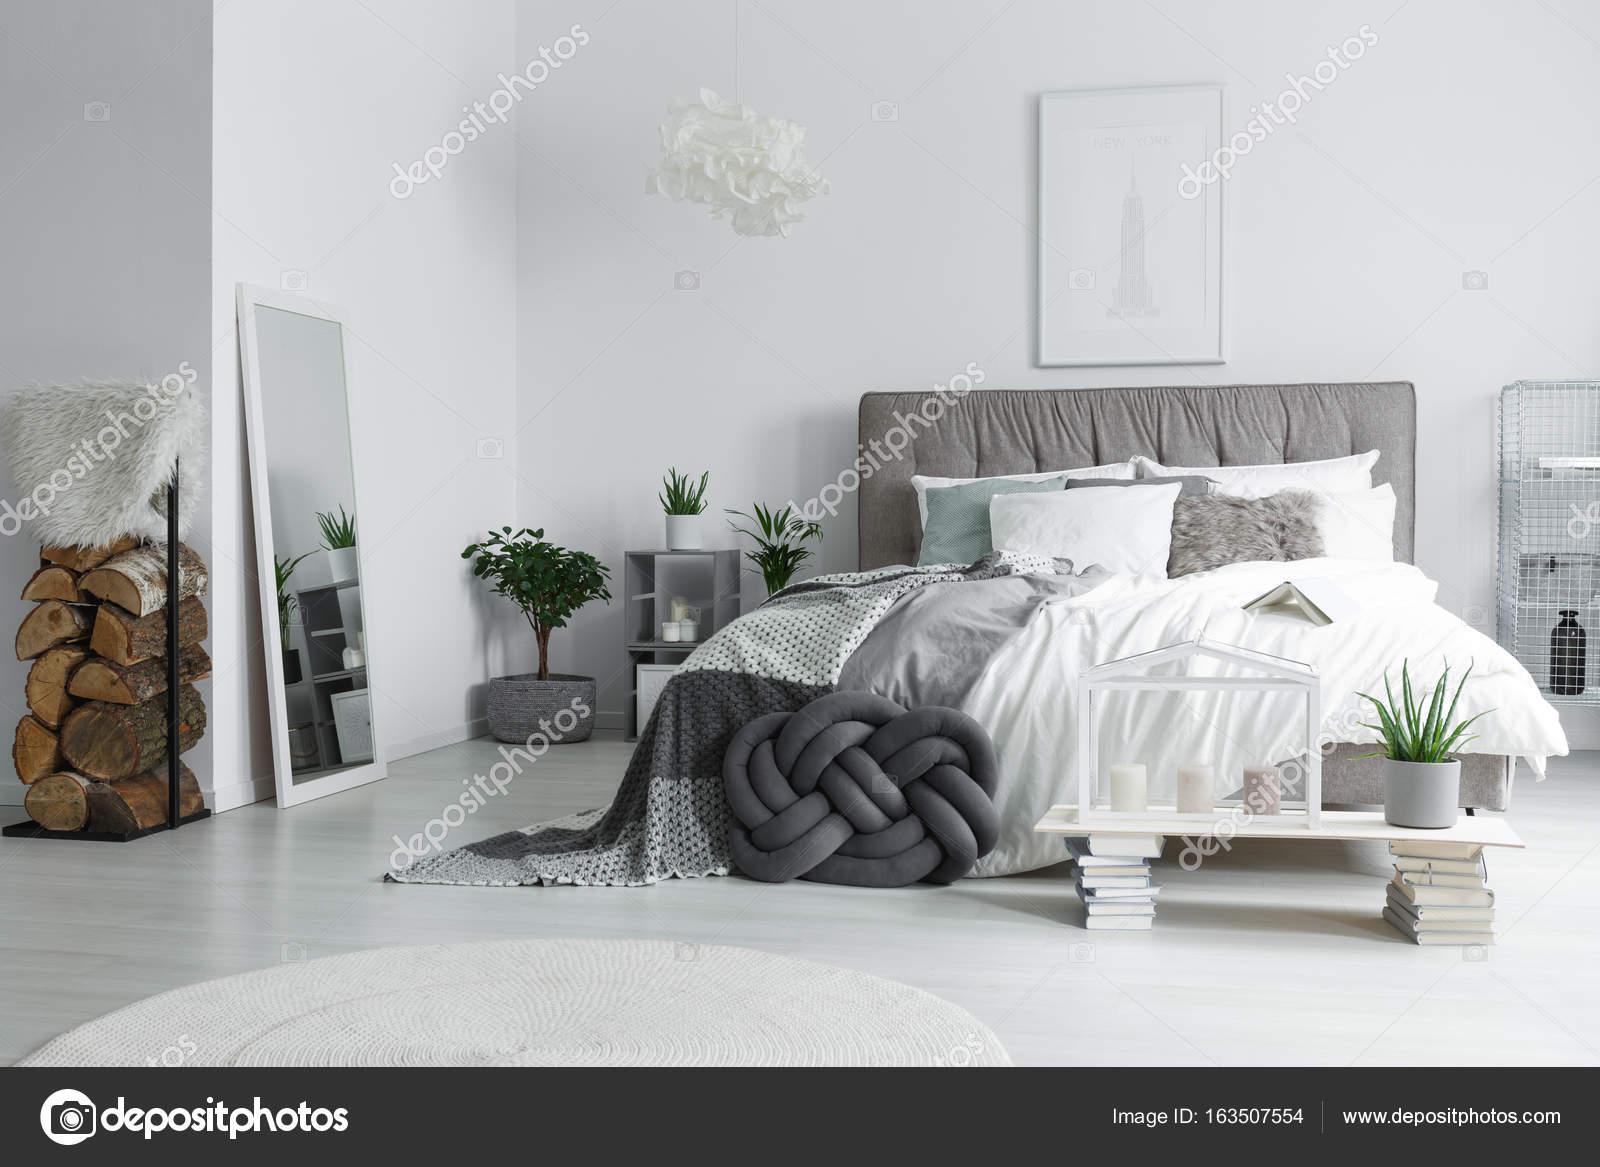 Spiegel in lichte slaapkamer — Stockfoto © photographee.eu #163507554